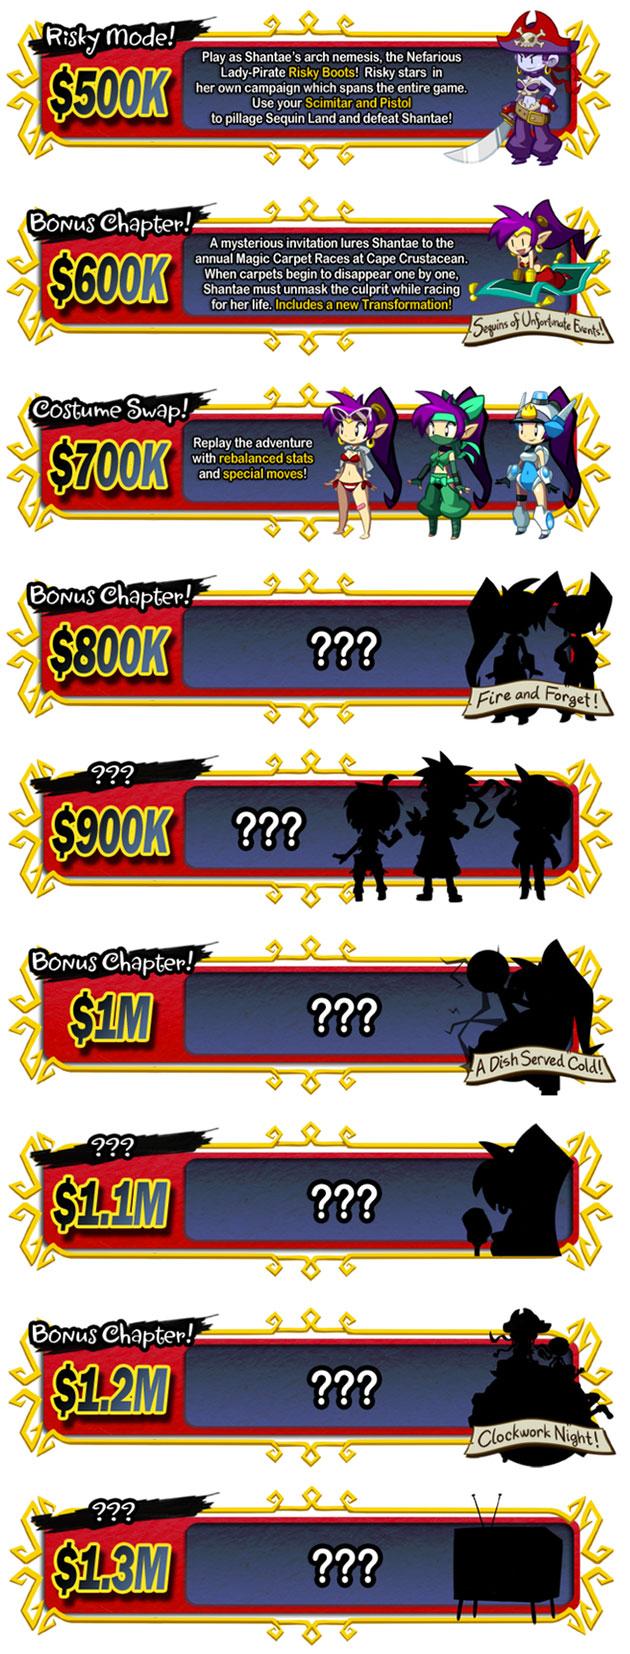 shantae-half-genie-hero-recompensa